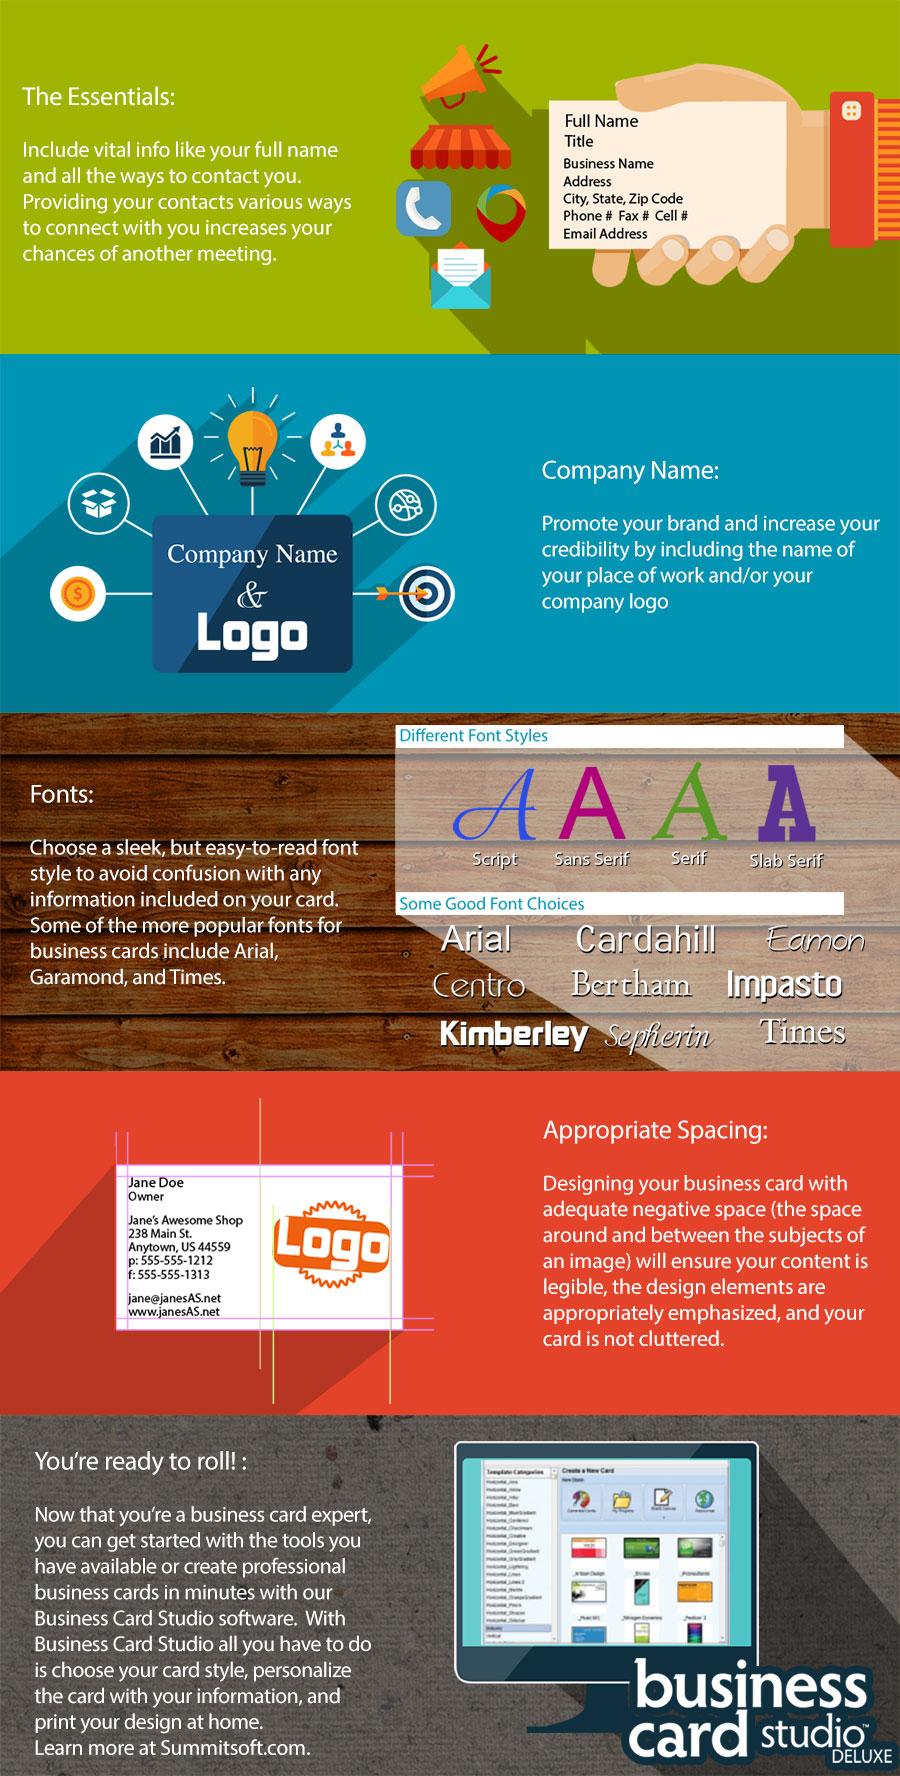 businesscardstudioinfographic